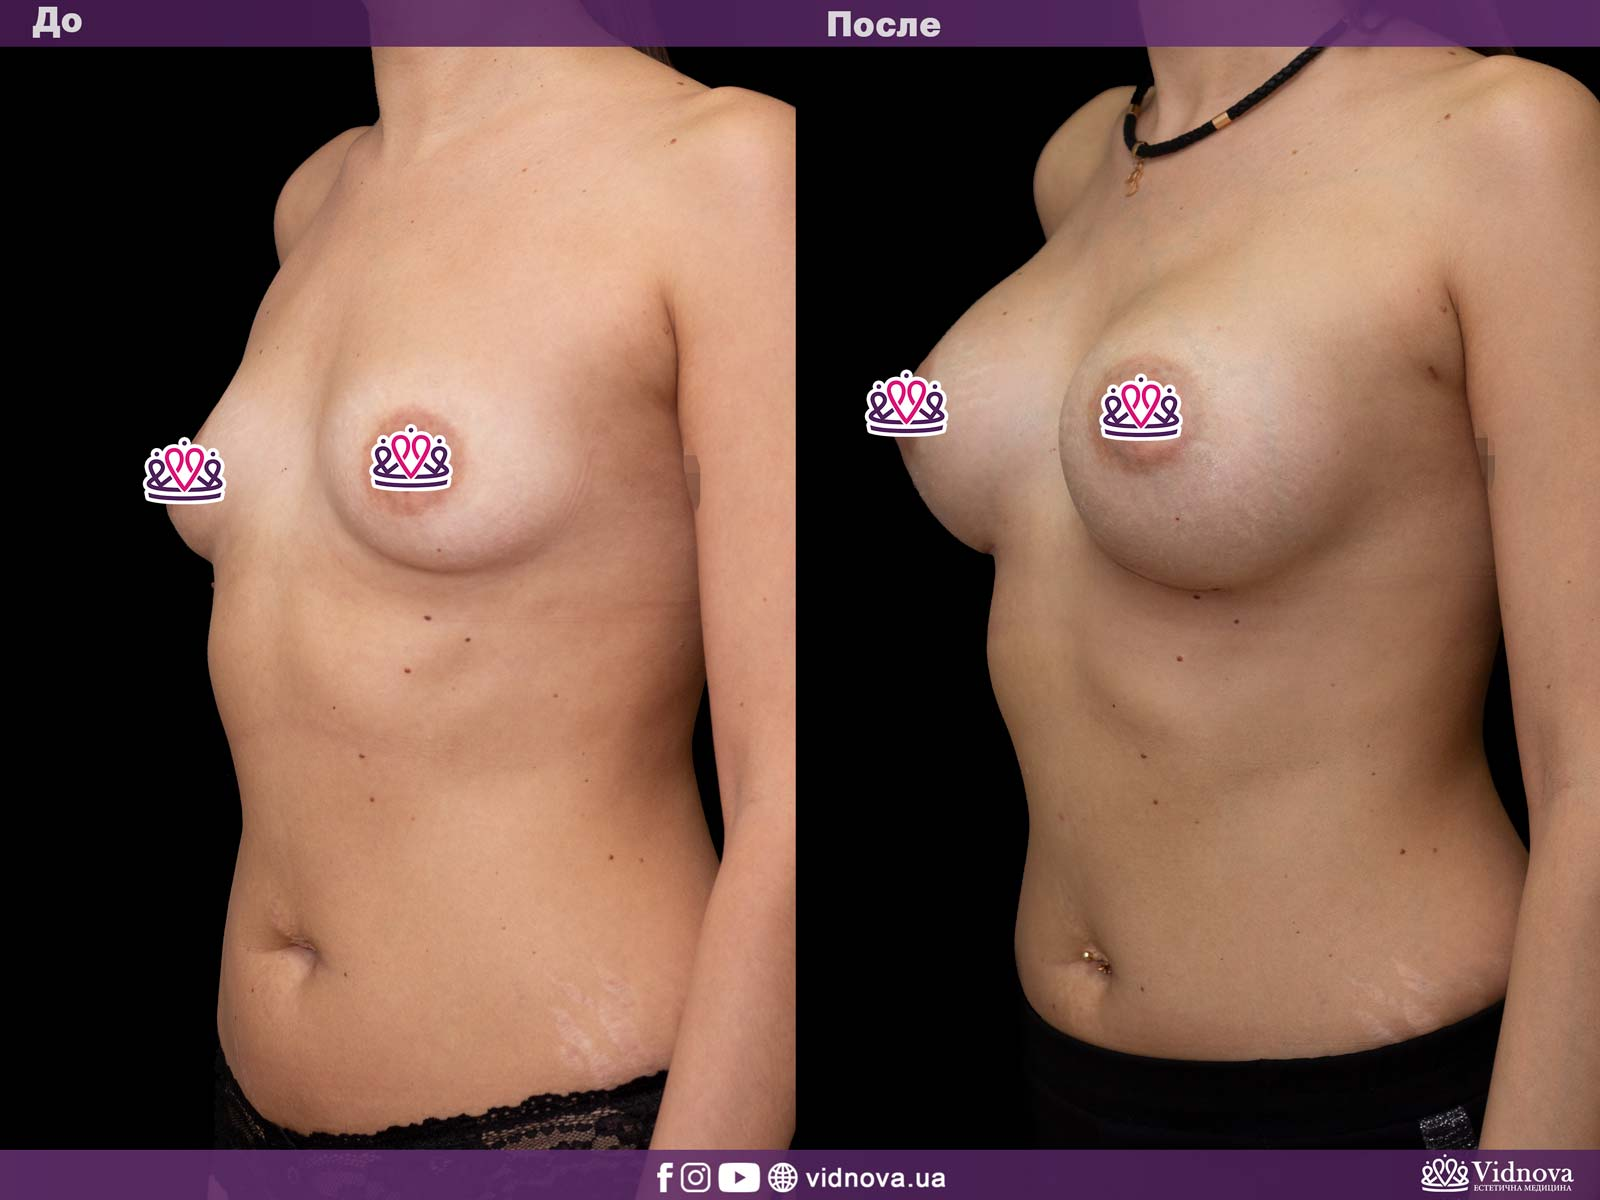 Увеличение груди: Фото ДО и ПОСЛЕ - Пример №19-2 - Клиника Vidnova